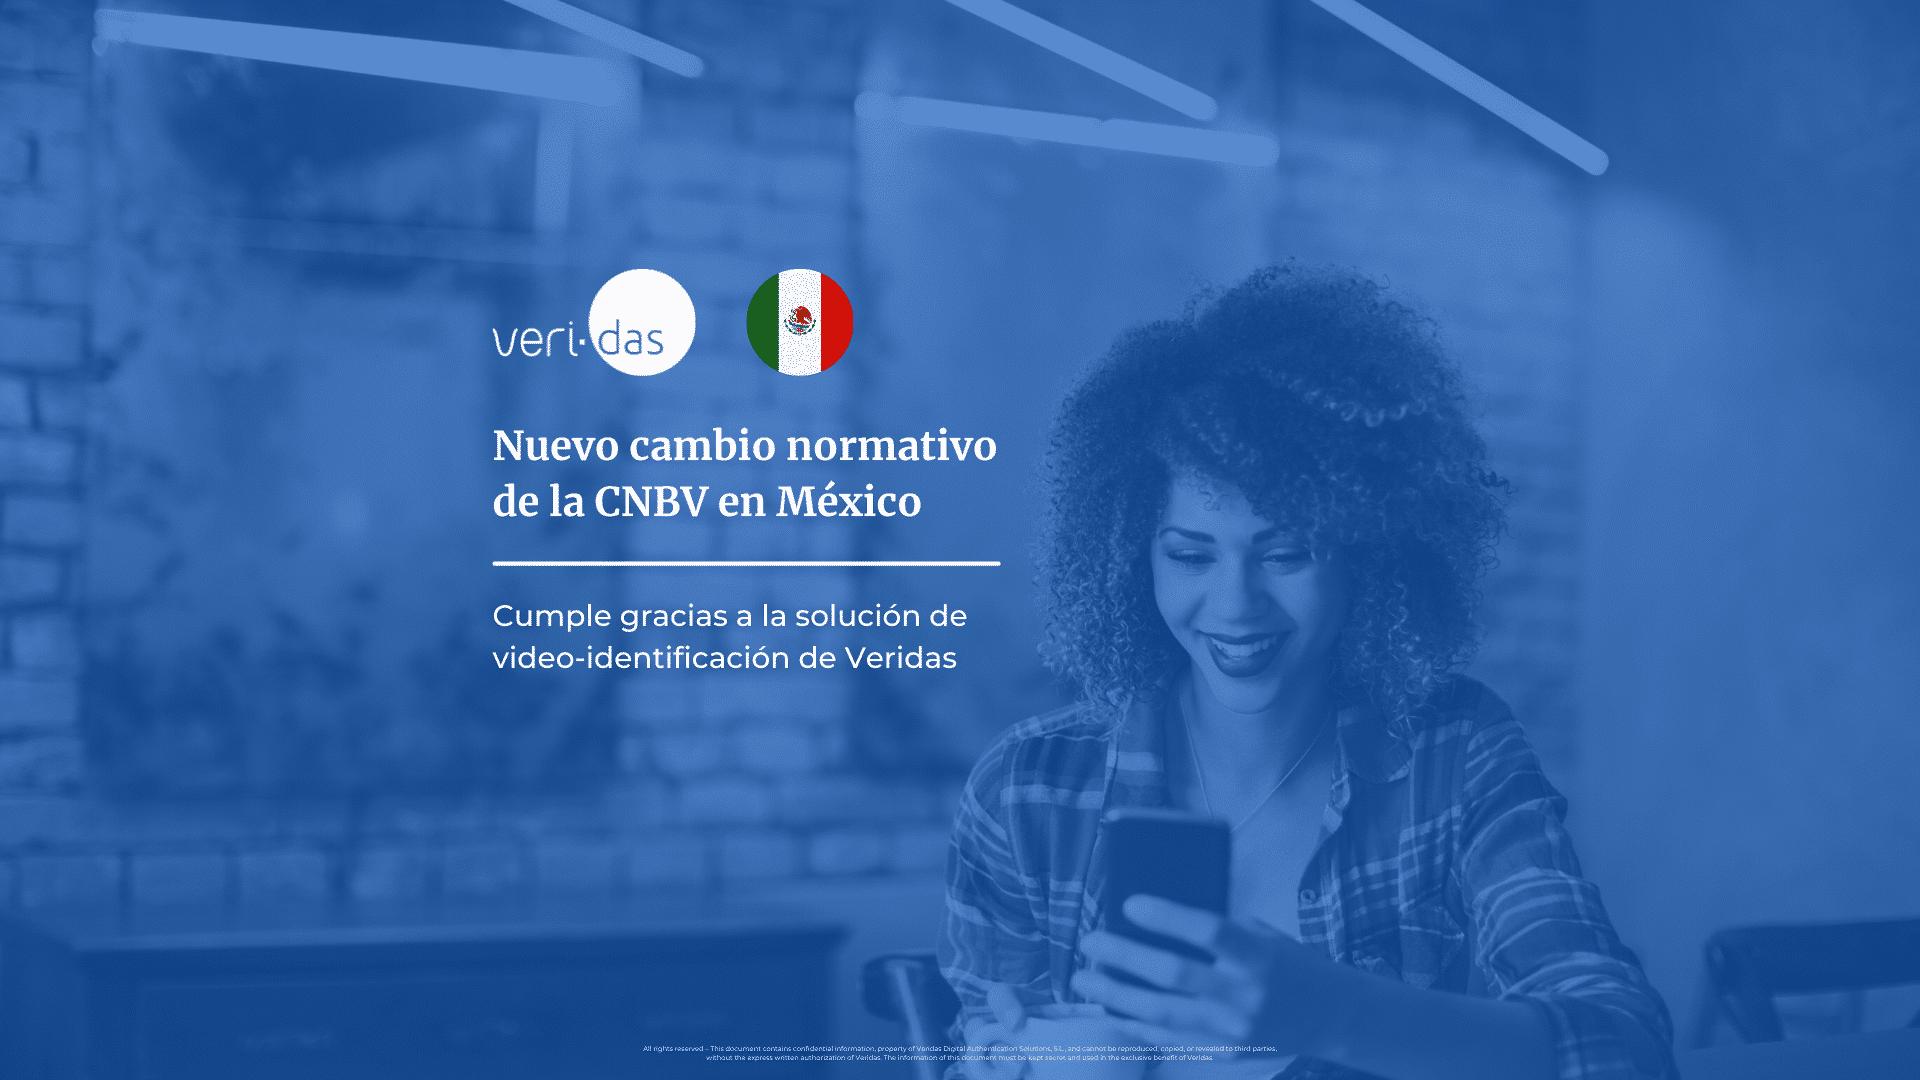 Instituto Nacional Electoral de México - Motor biométrico facial